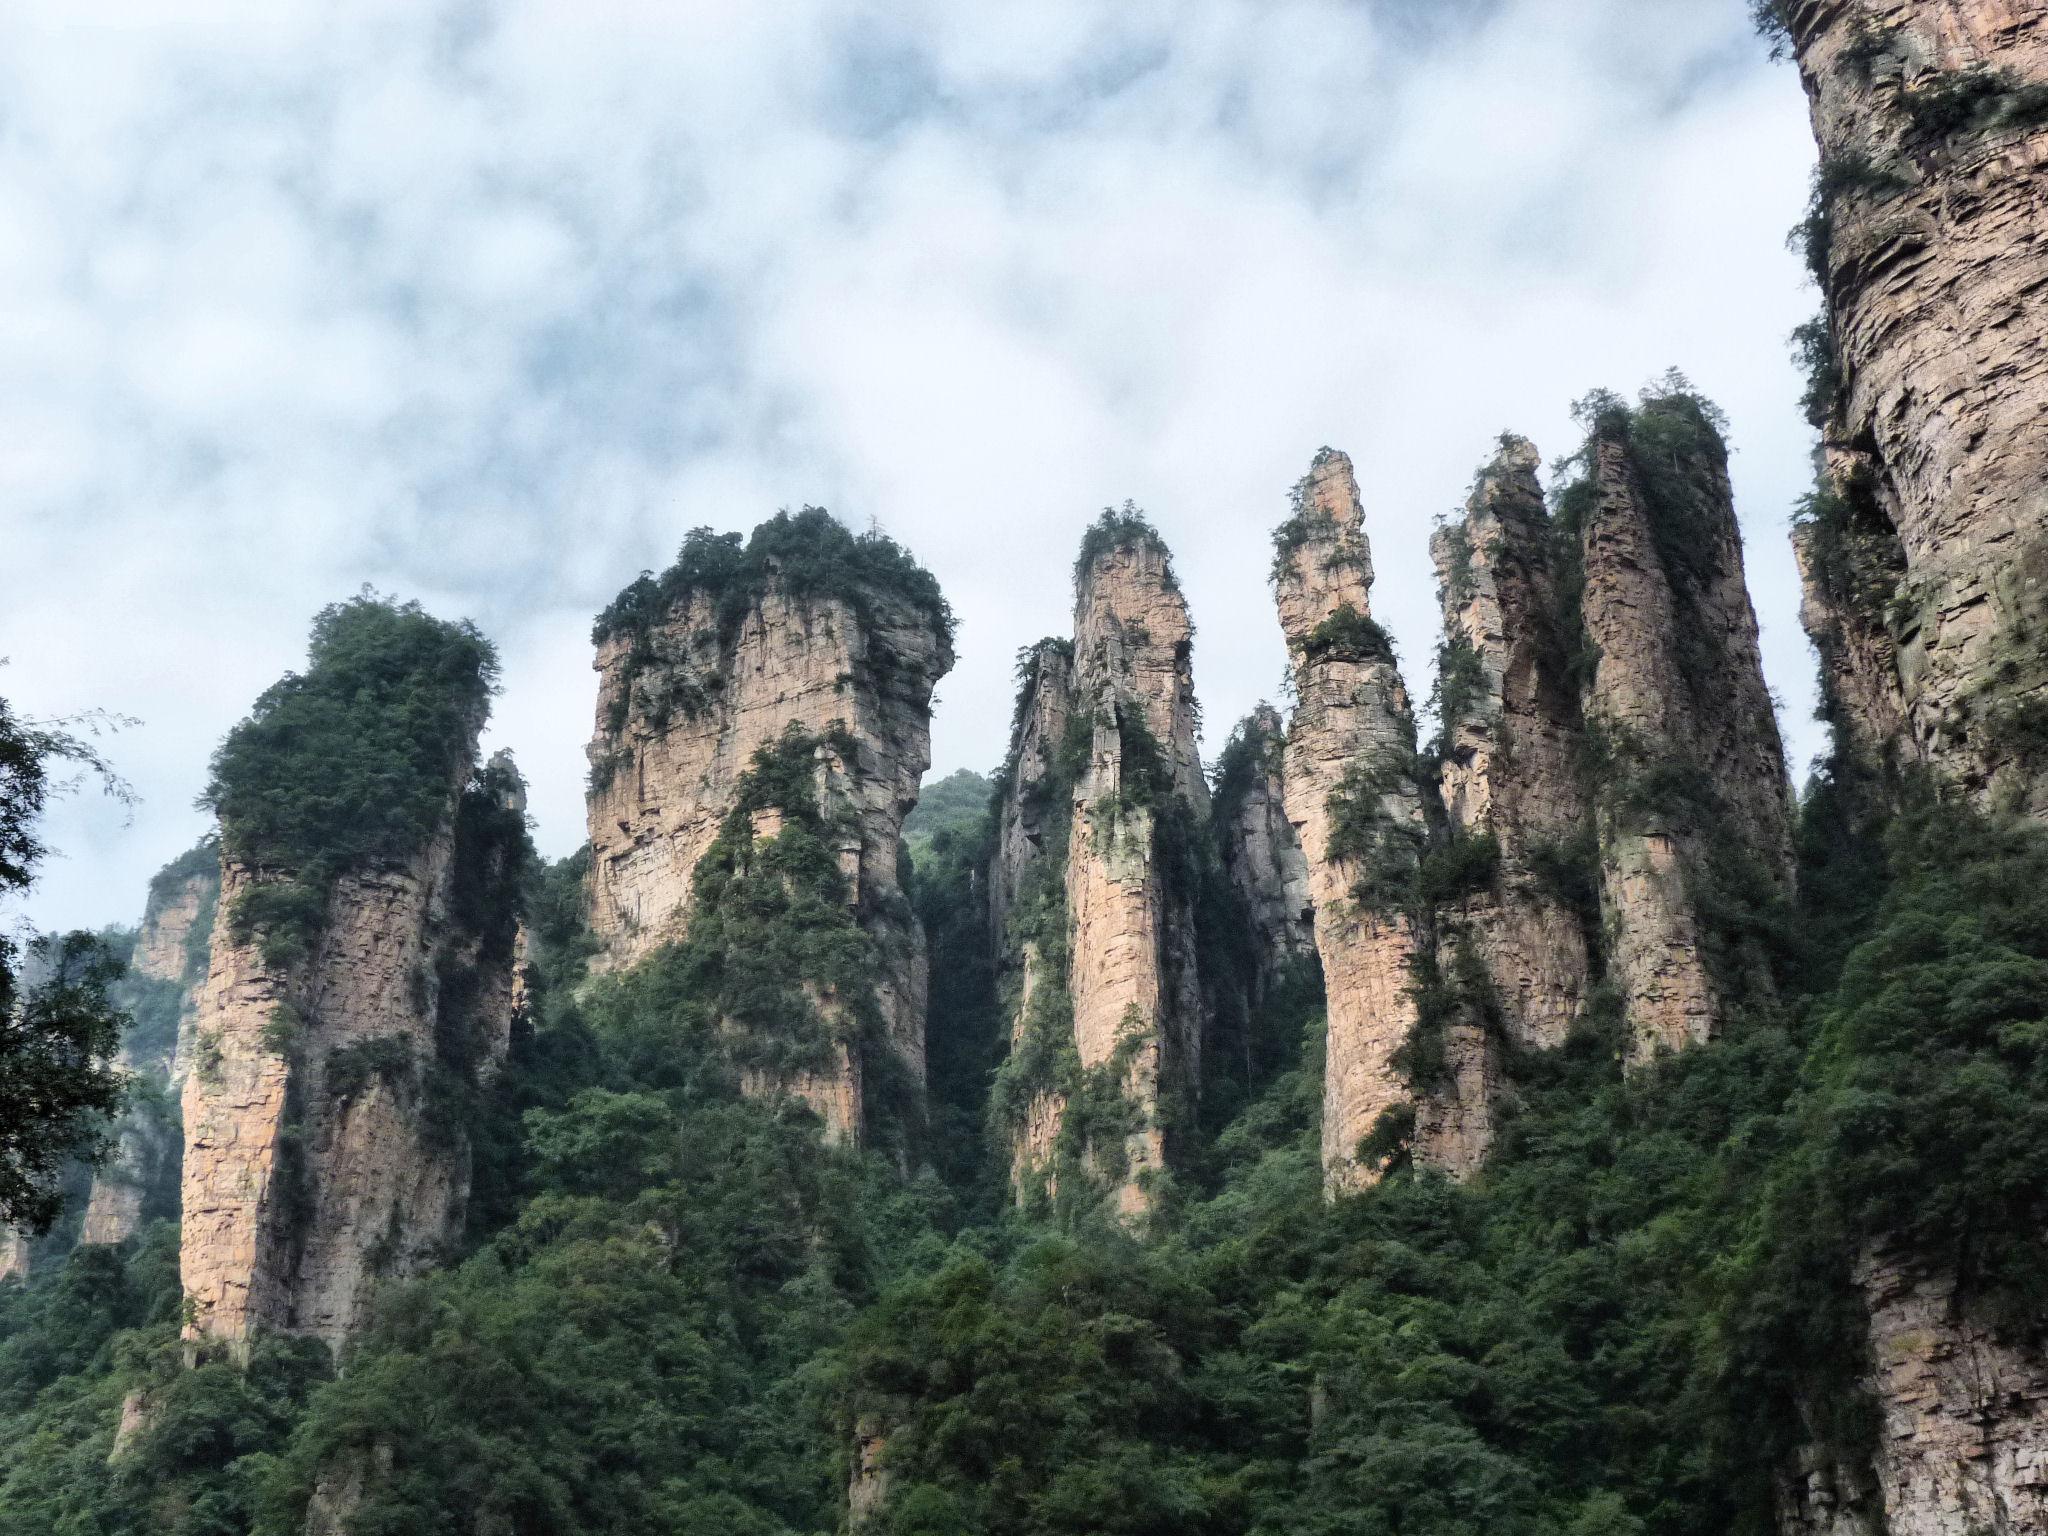 Best Rock Pillars / Formations